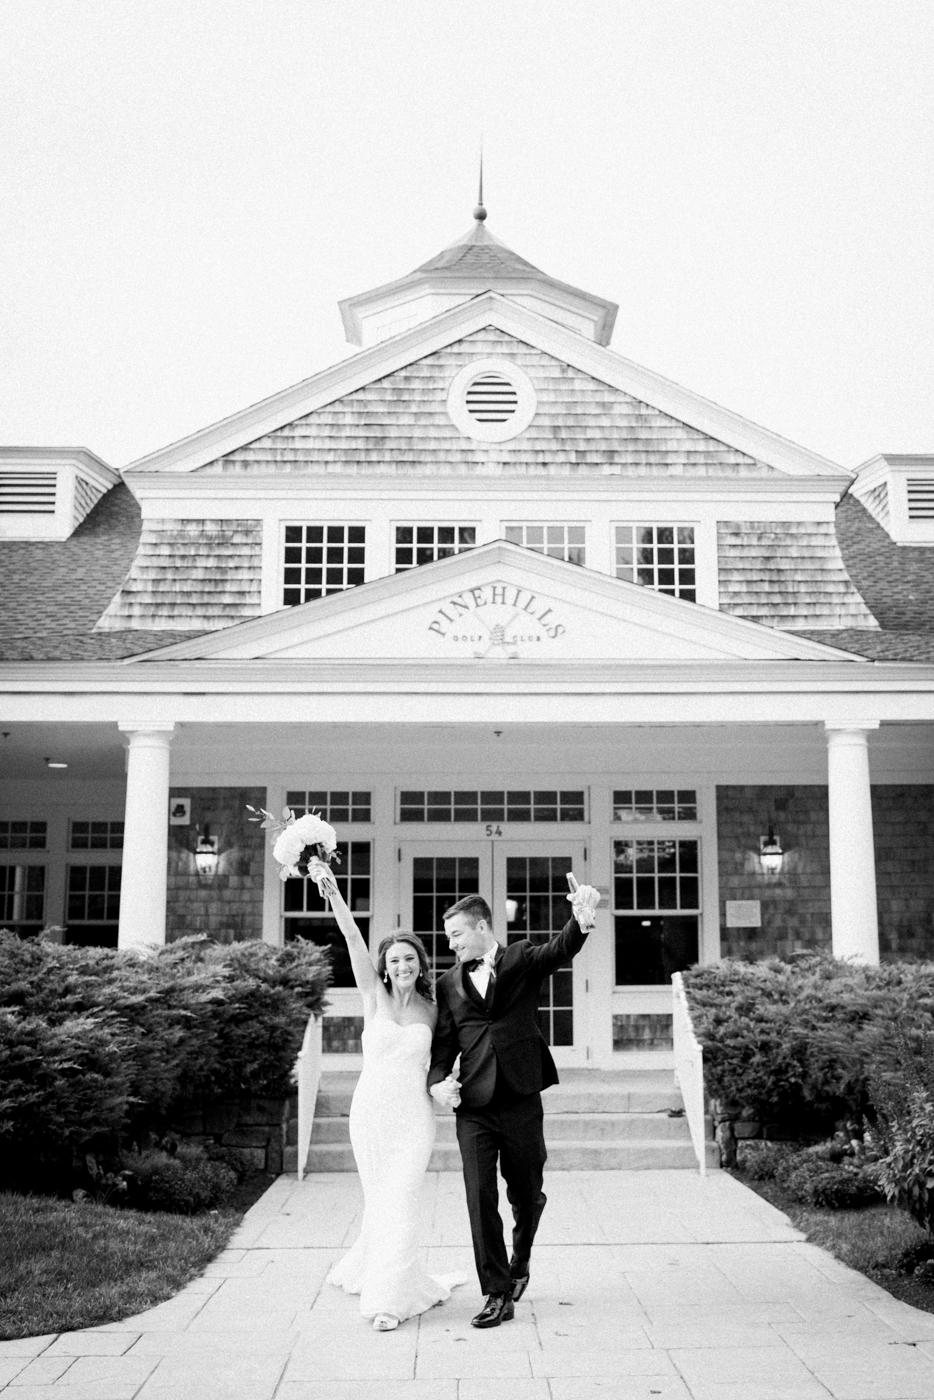 Top wedding photographers in New england